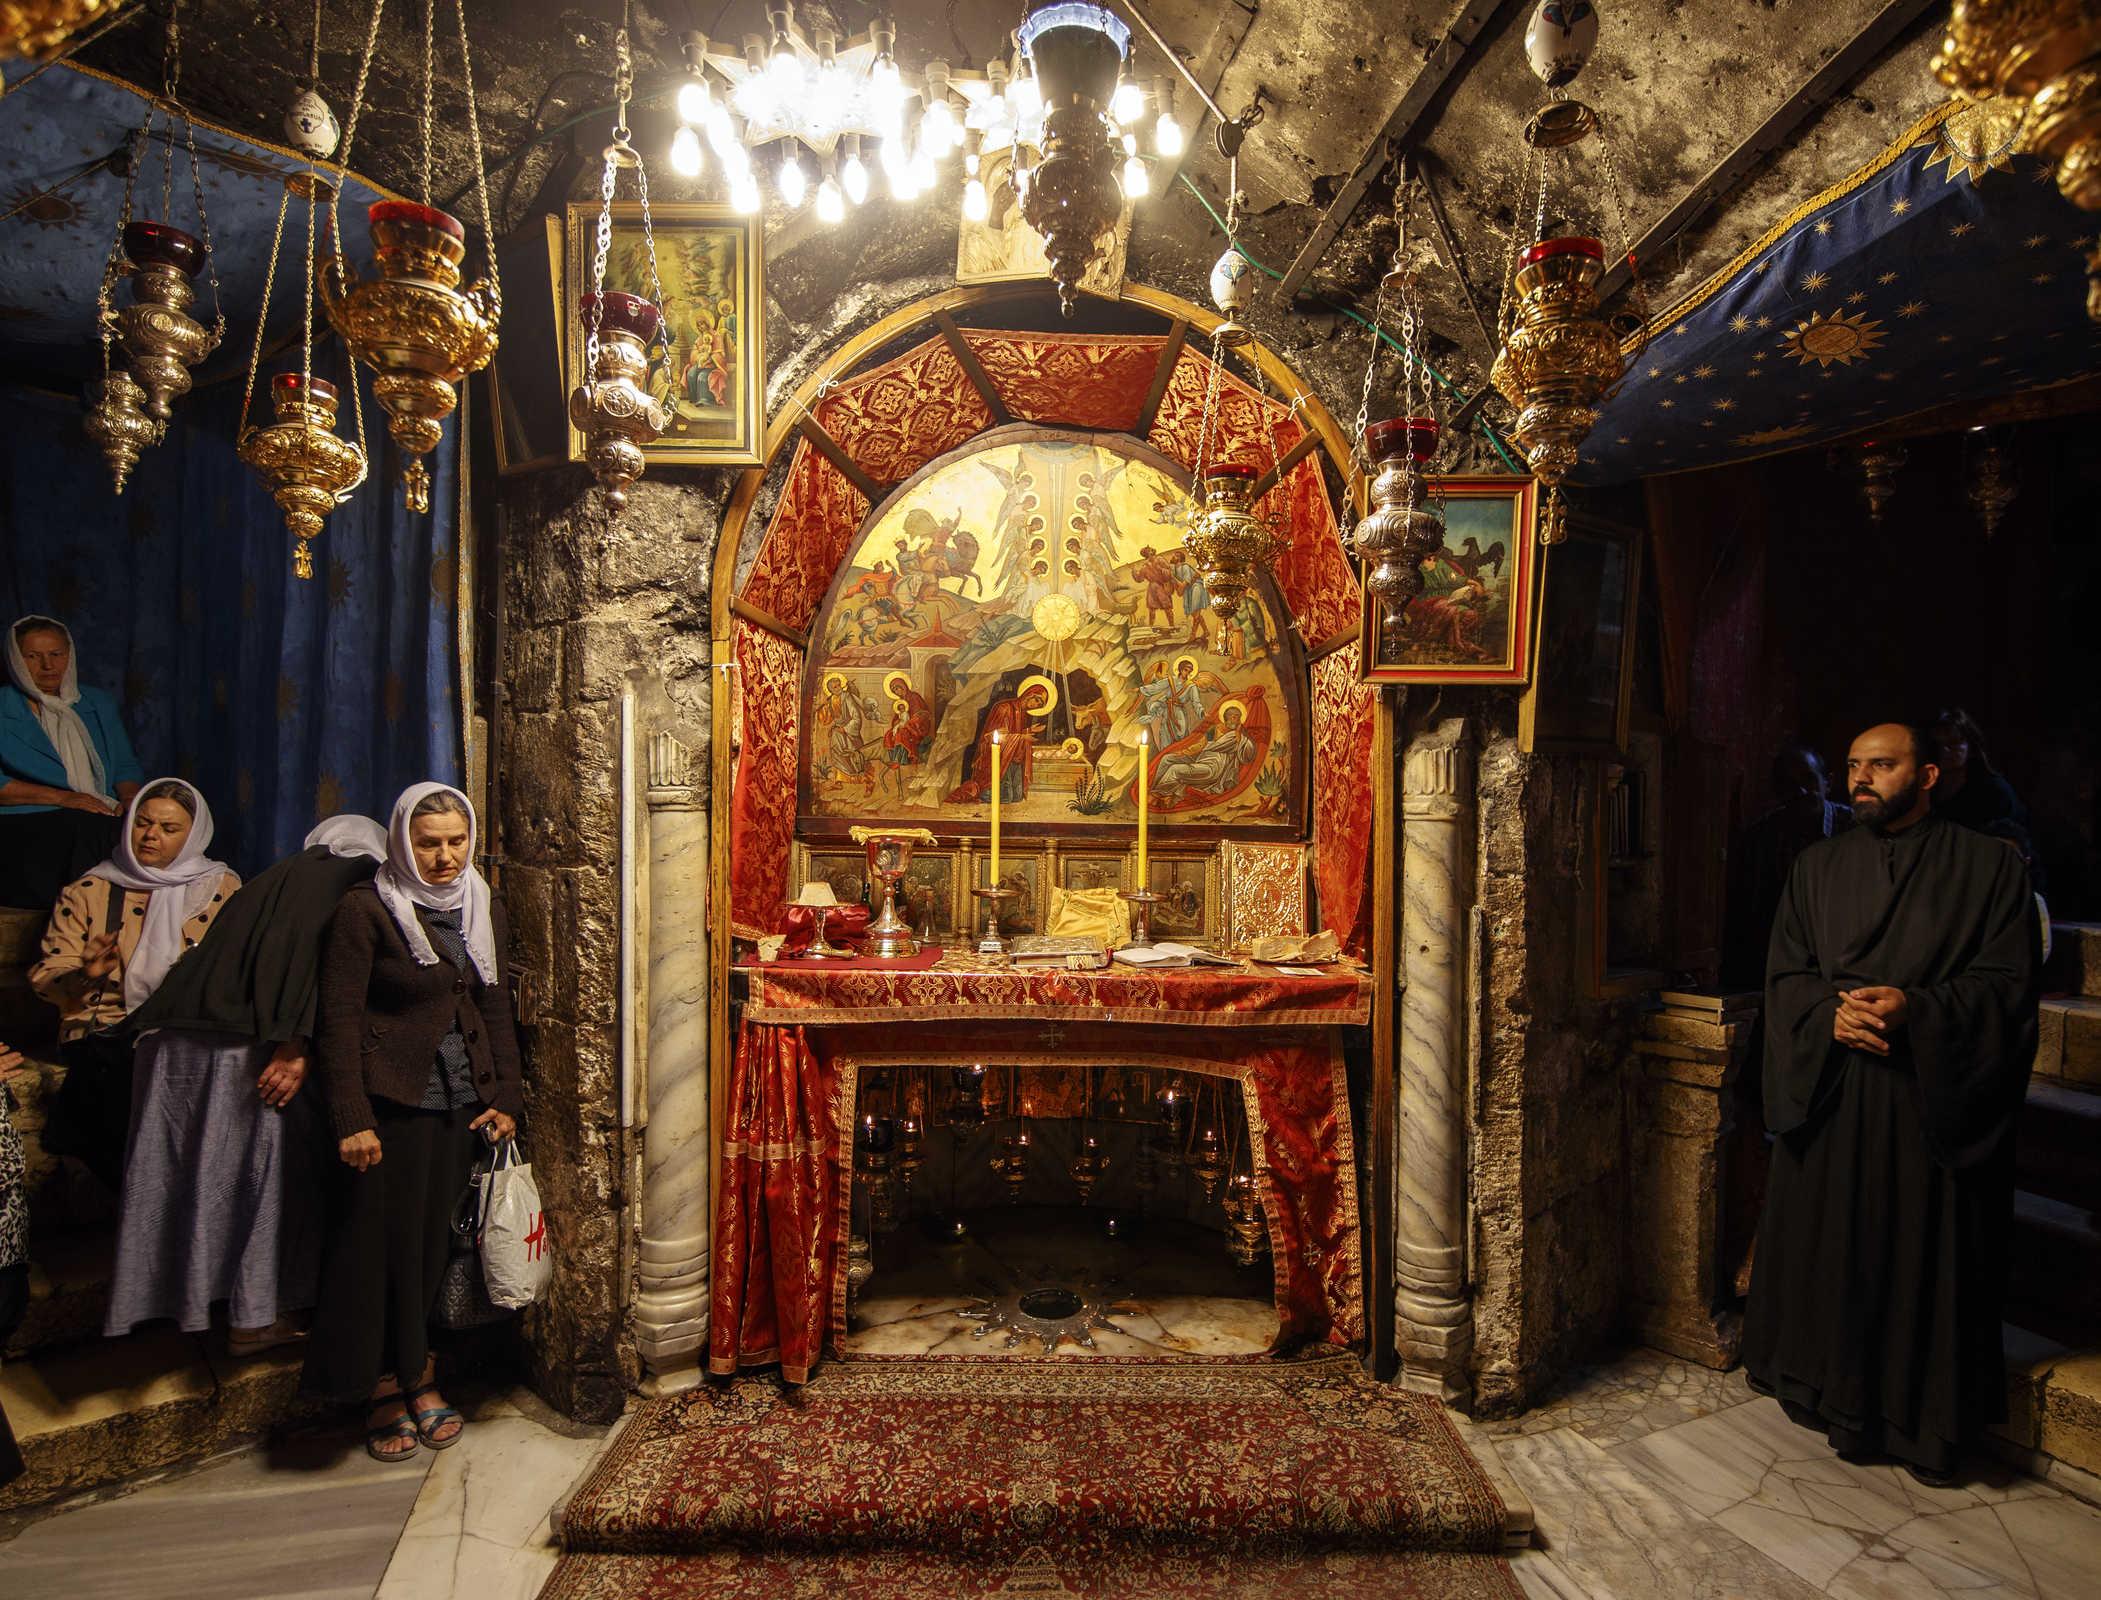 Un dar de Crăciun - Fotoreportaj de la Betleem